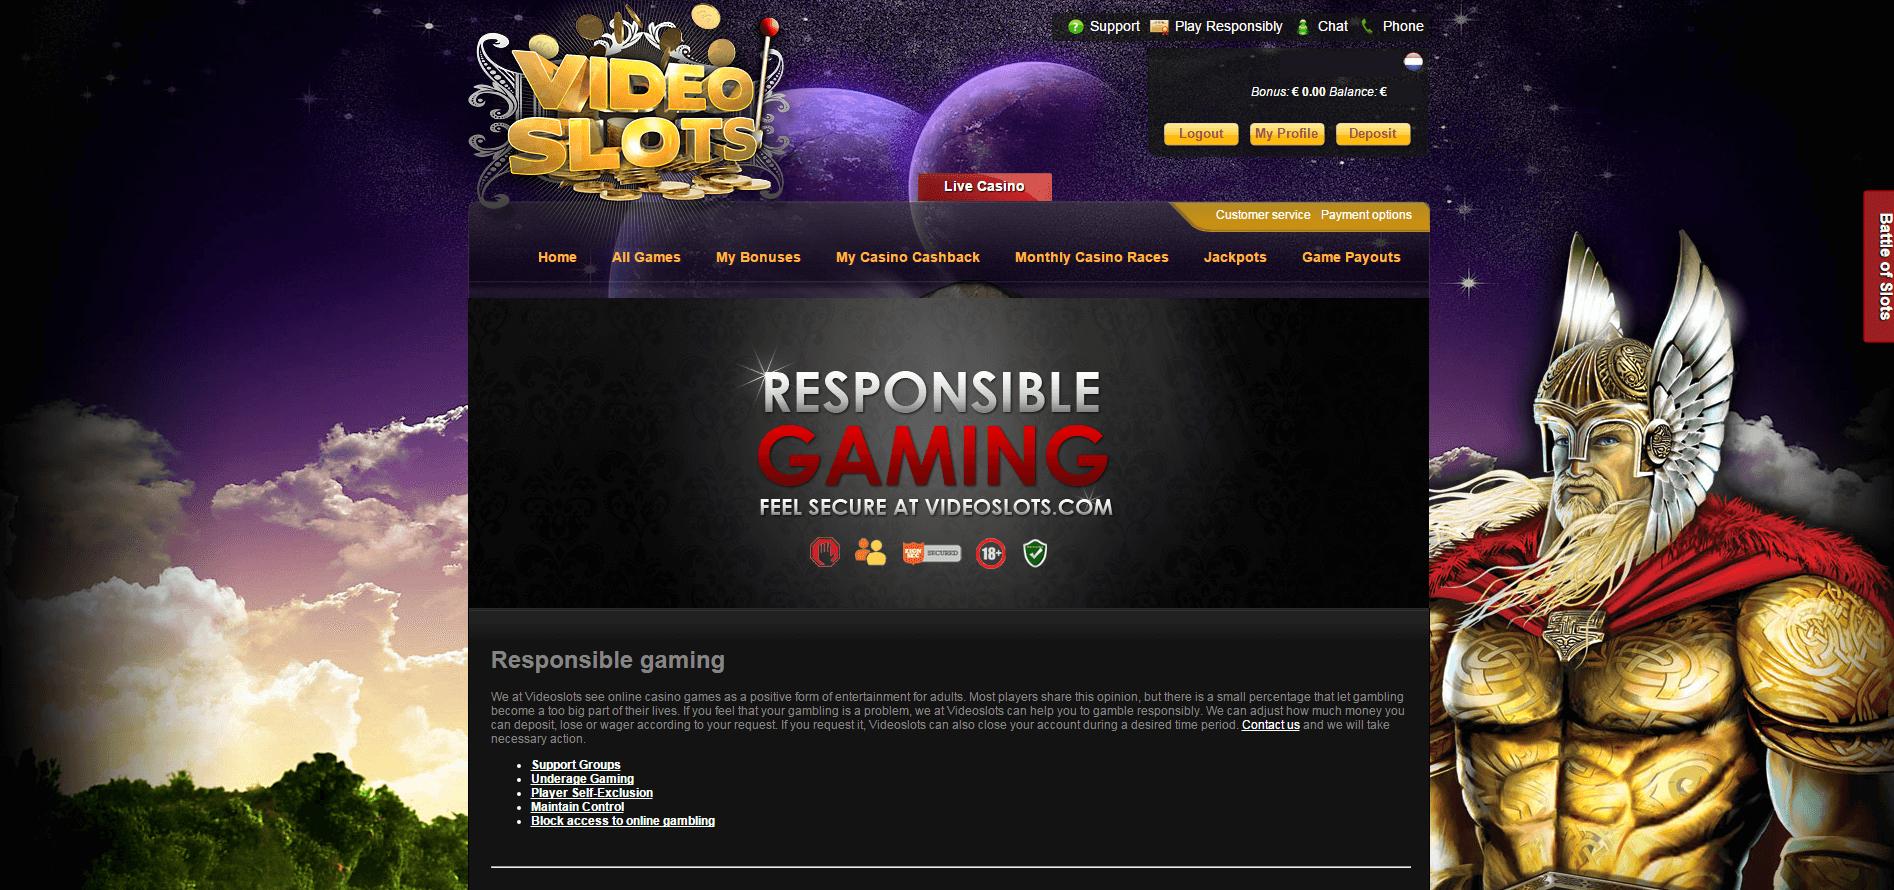 Videoslots.com NetEnt Live Casino Support